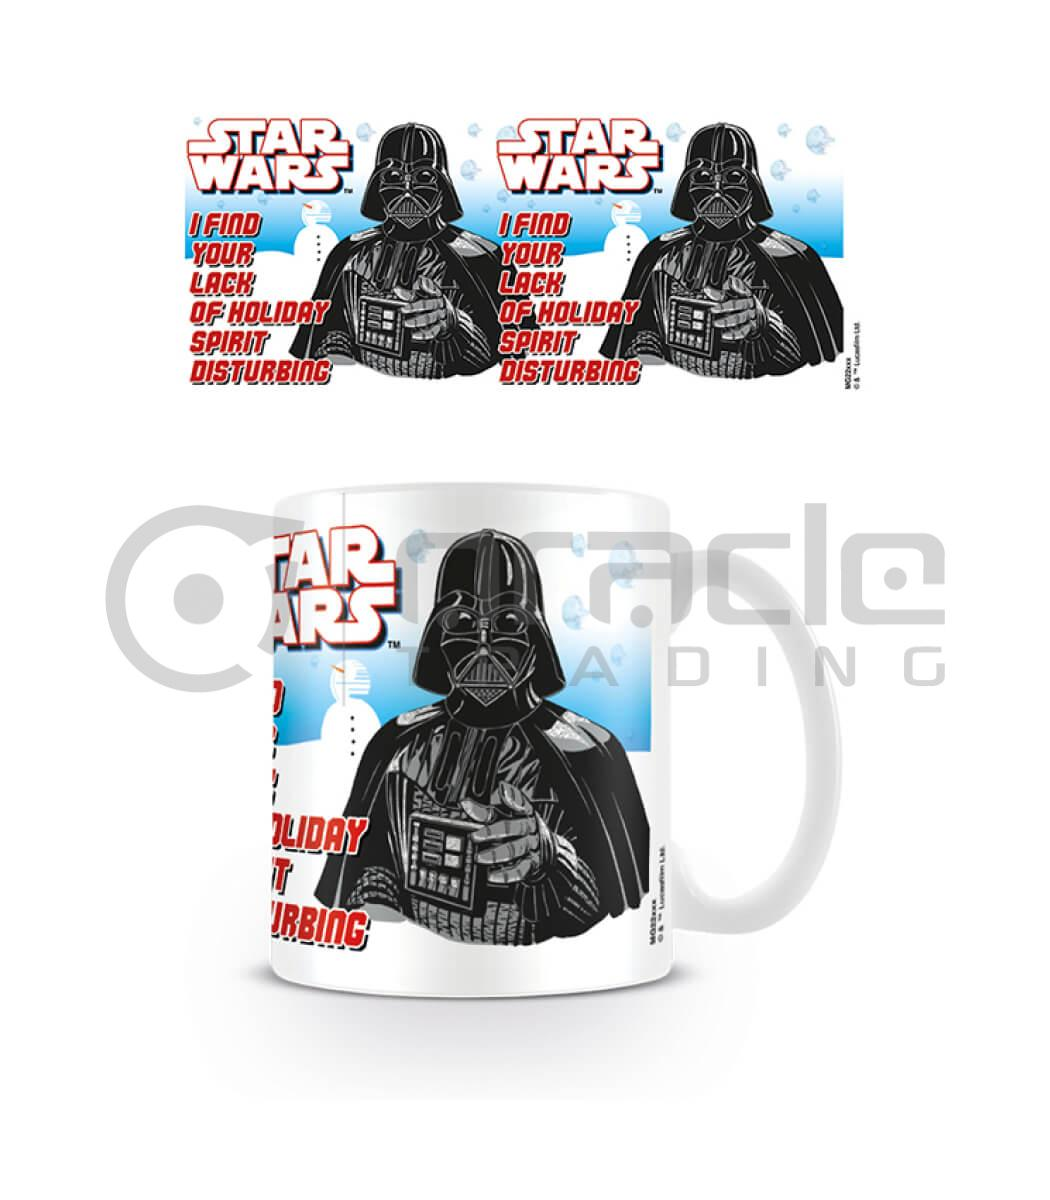 Star Wars Mug - Holiday Spirit